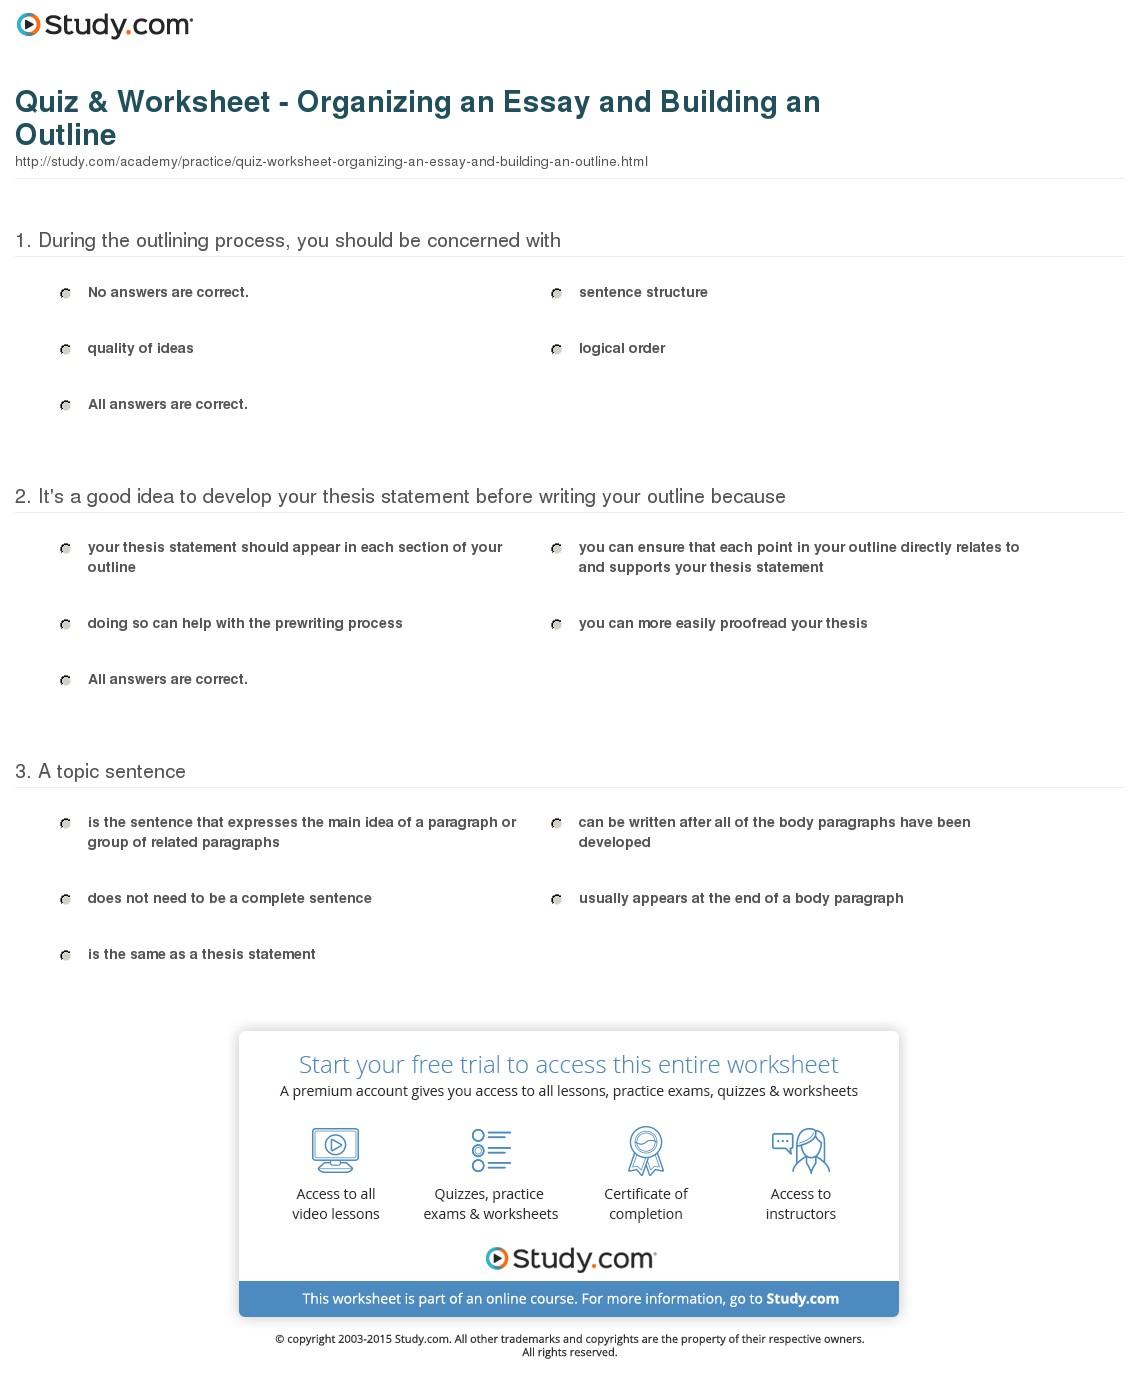 017 Essay Example Outline Of Quiz Worksheet Organizing An And Impressive Argumentative Sample Mla Format Full